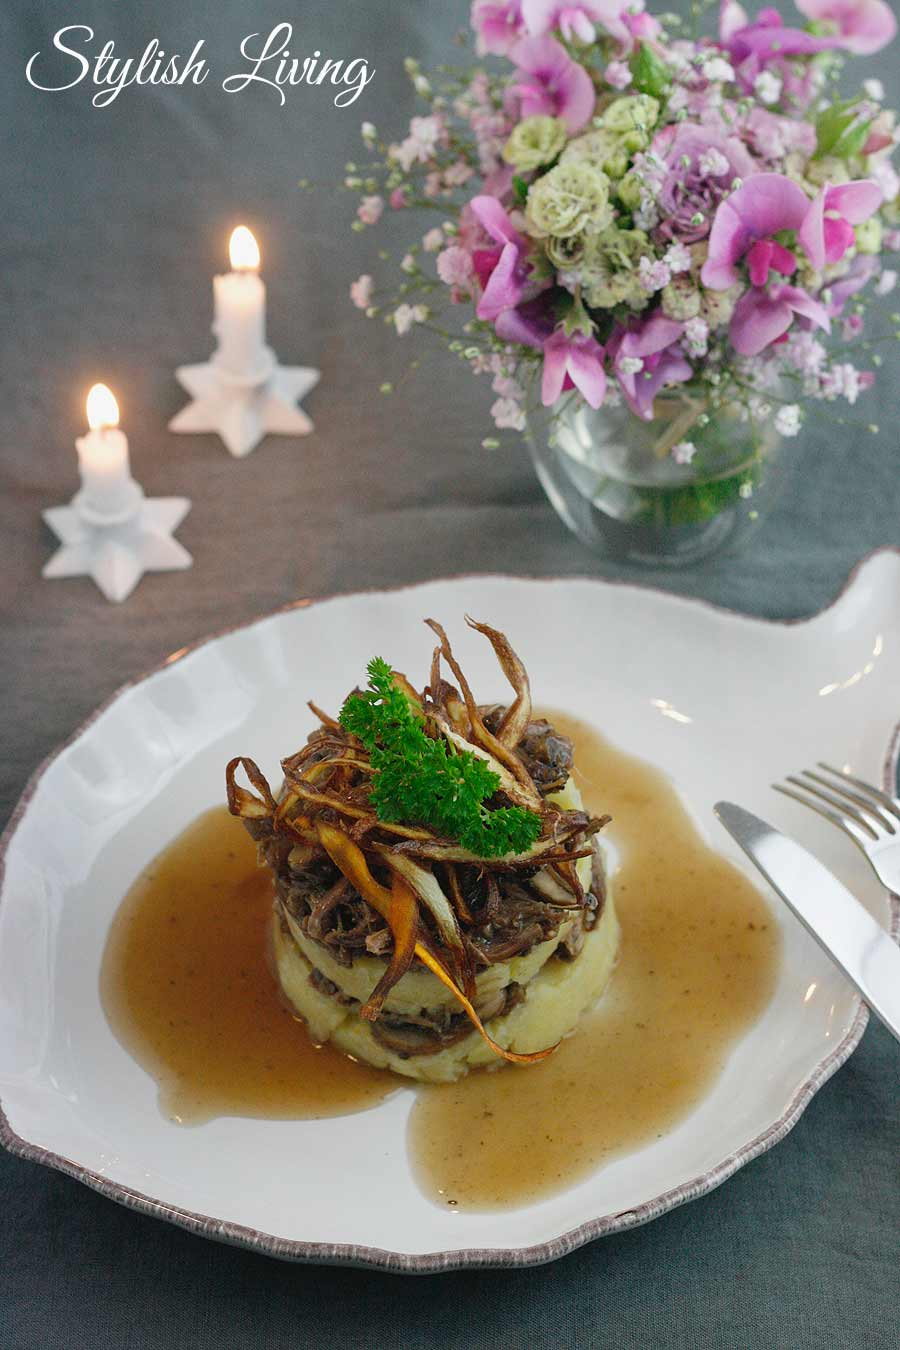 Ochsenschwanzragout mit Kartoffel-Sellerie-Püree